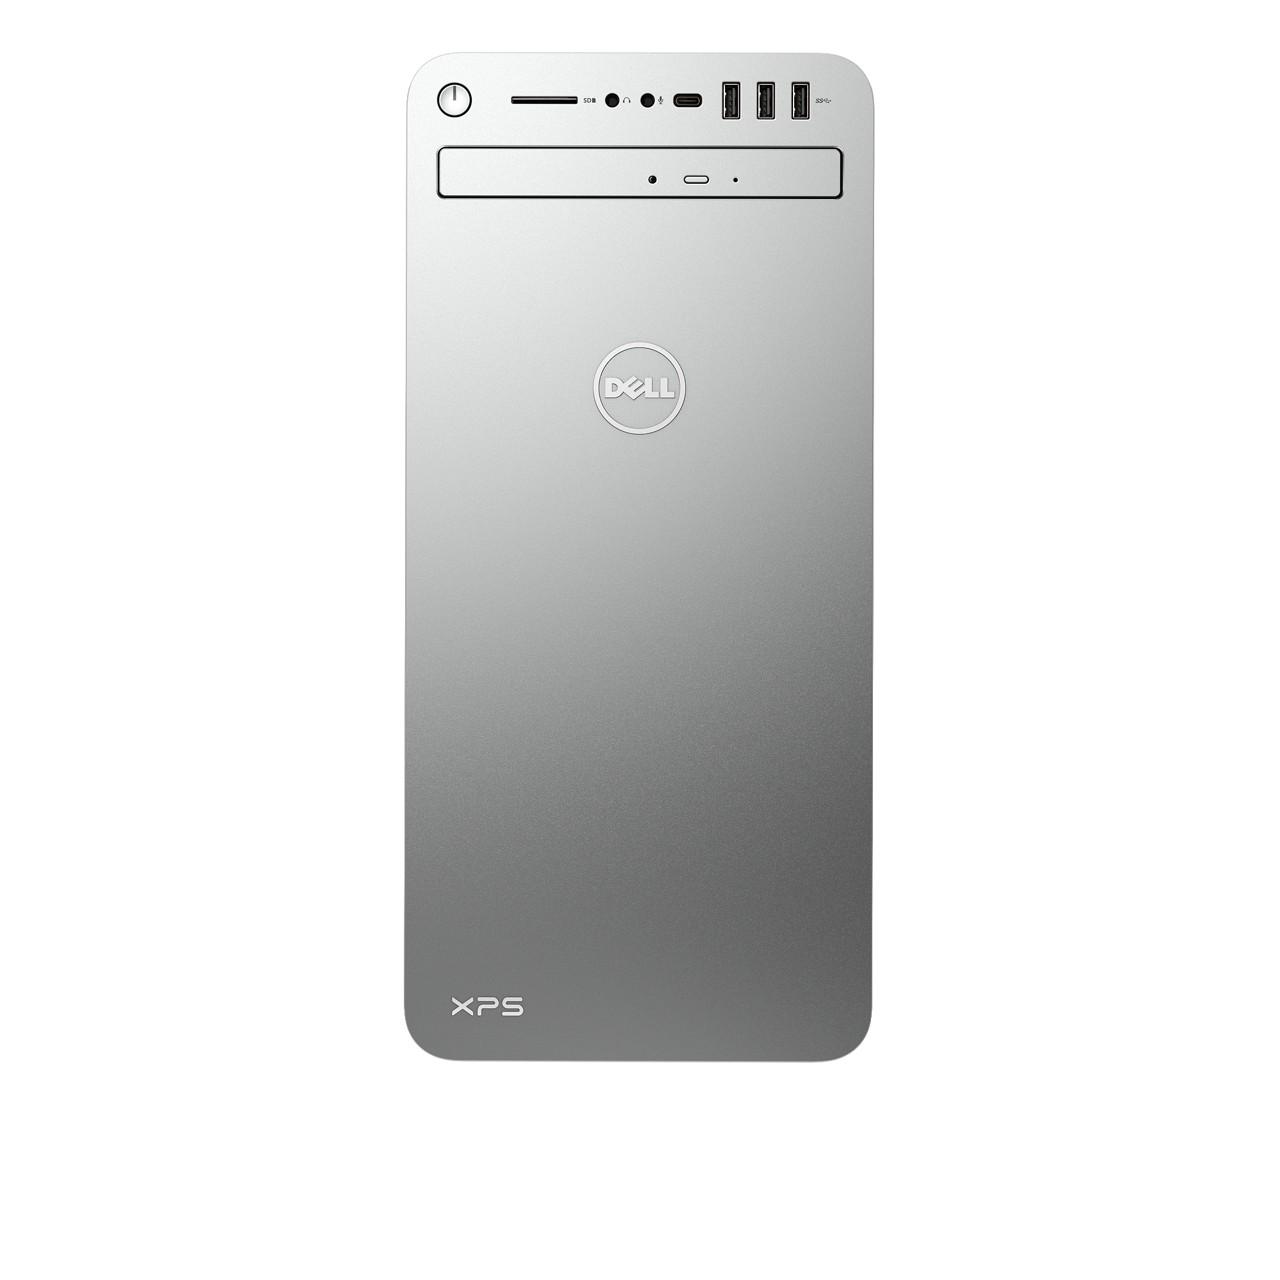 Dell XPS 8930 SE Desktop Intel i7-9700K NVIDIA GTX 1070 256GB SSD + 2TB HDD  32GB RAM